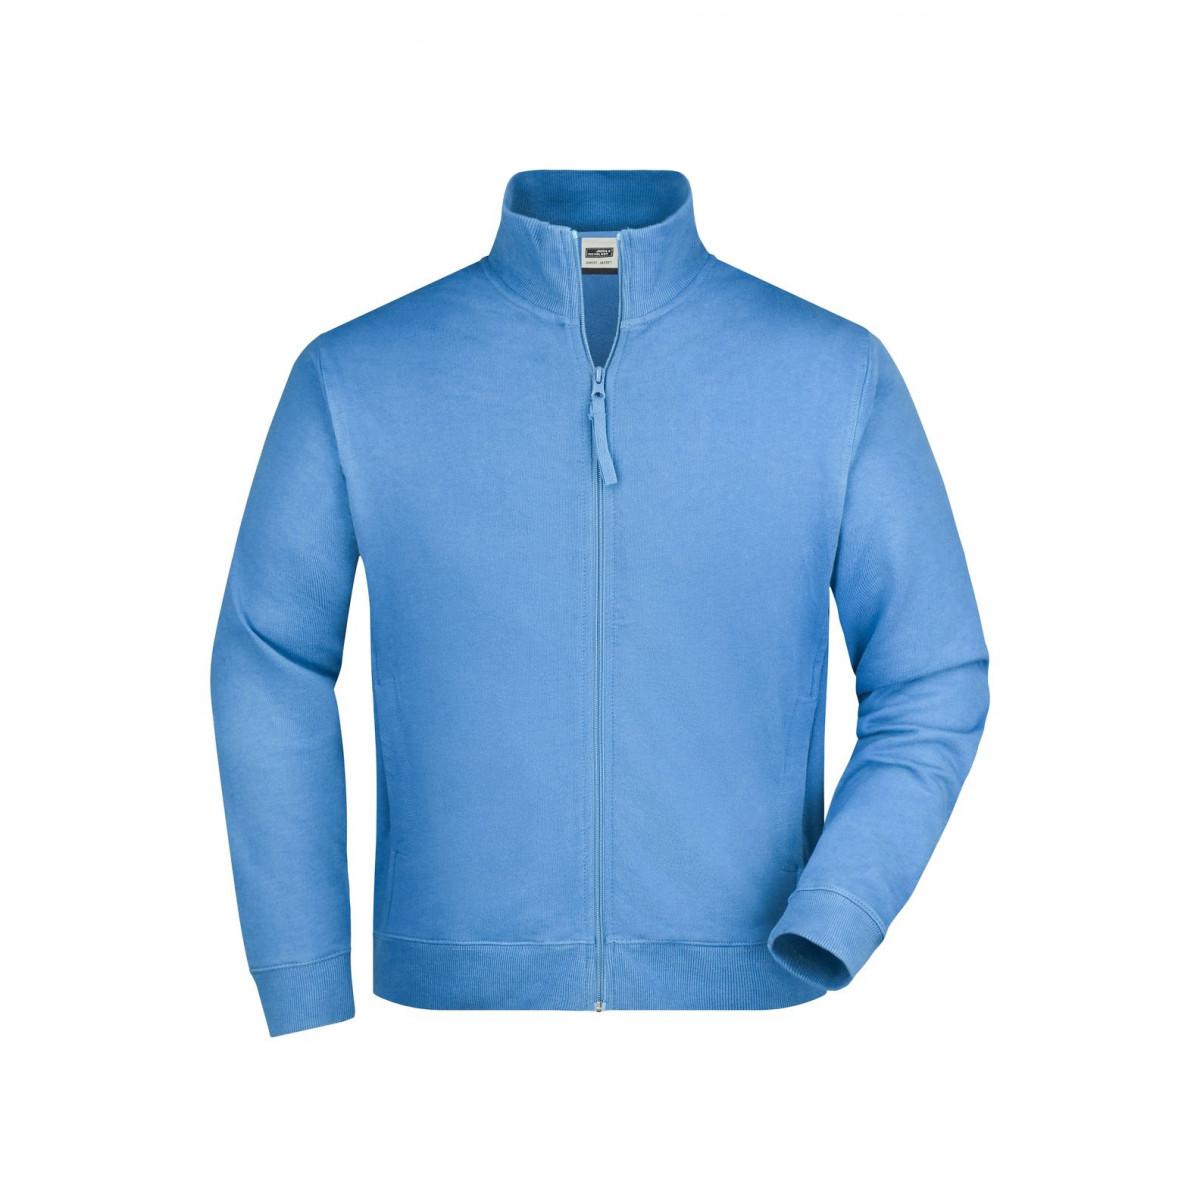 Толстовка мужская JN058 Sweat Jacket - Голубой